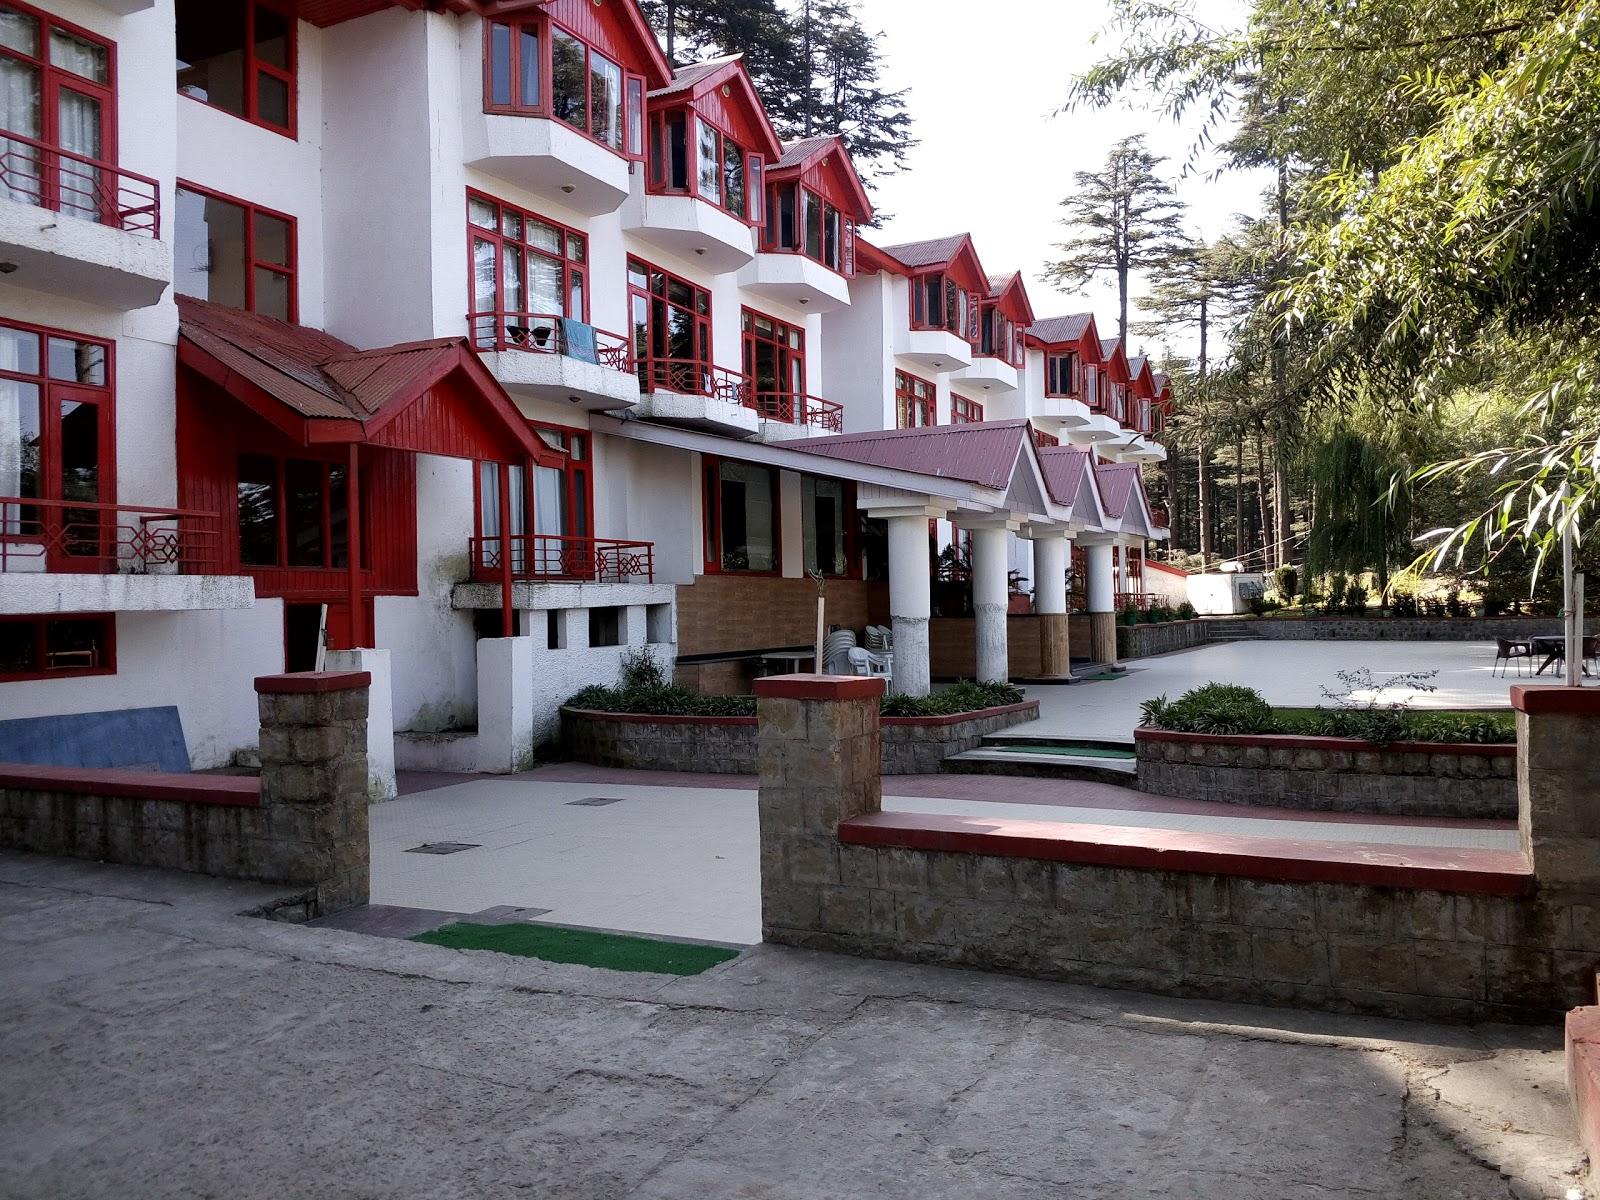 Hotel Jai Skahan Hotel Krystal By Parin Group Around Guides